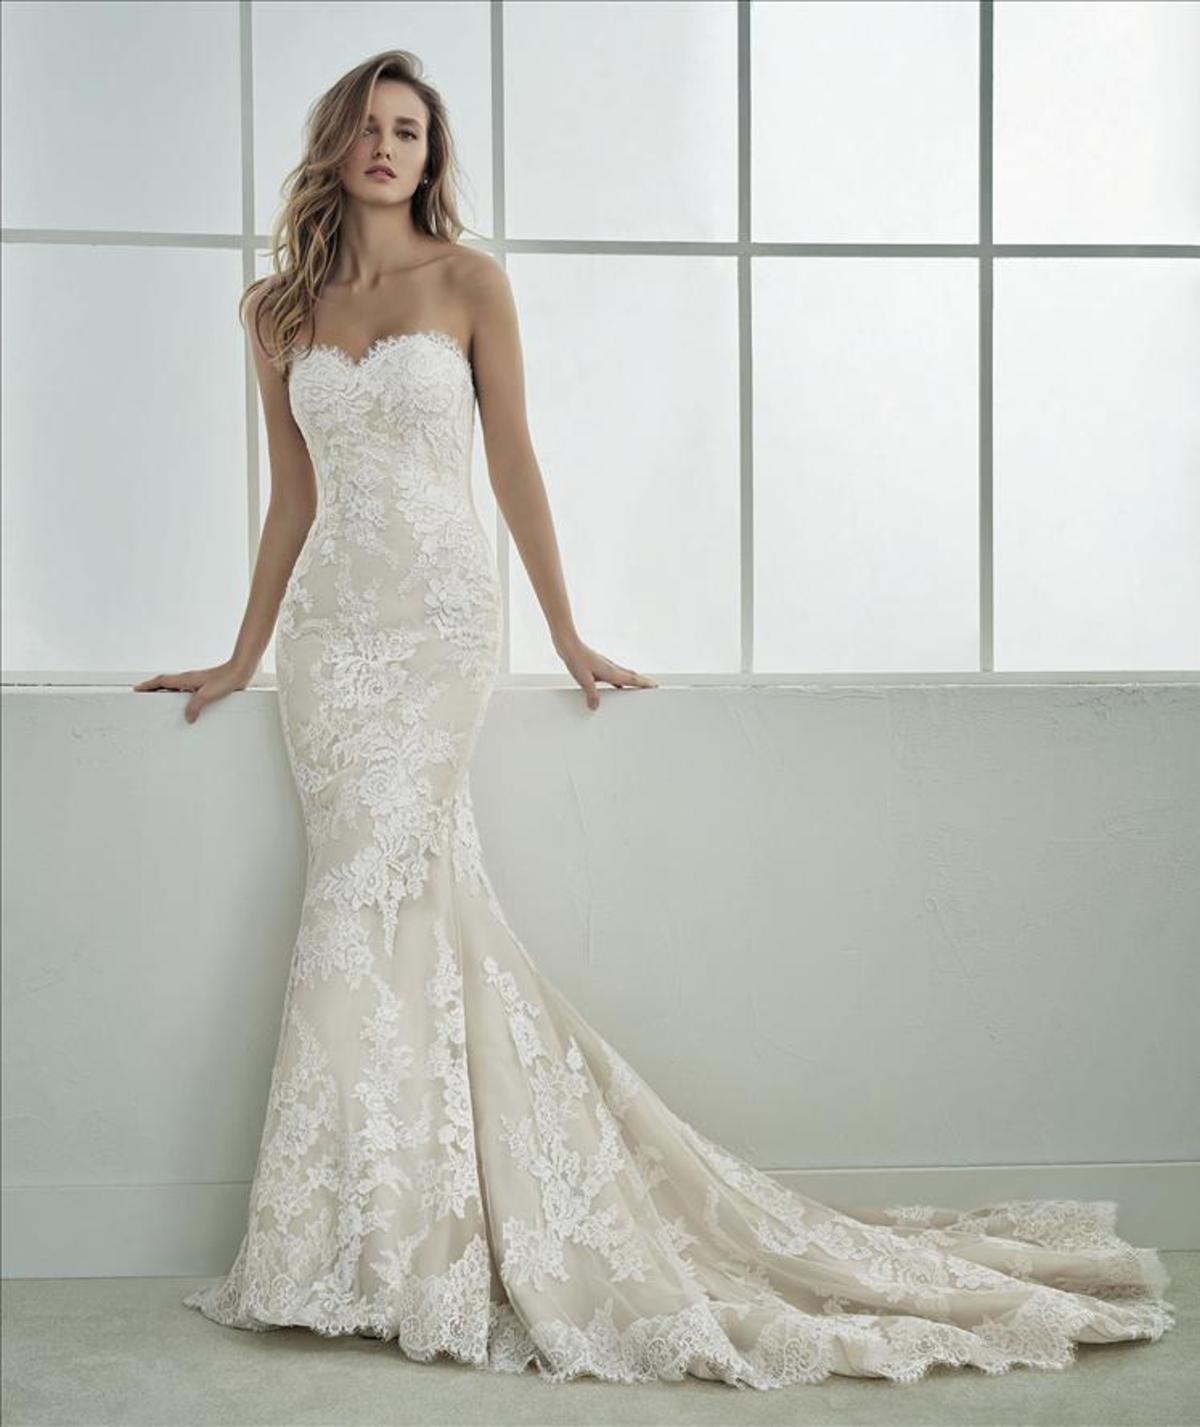 W1 Brautkleid FAMOSA B PV18 748 888 - Wir sagen Ja!